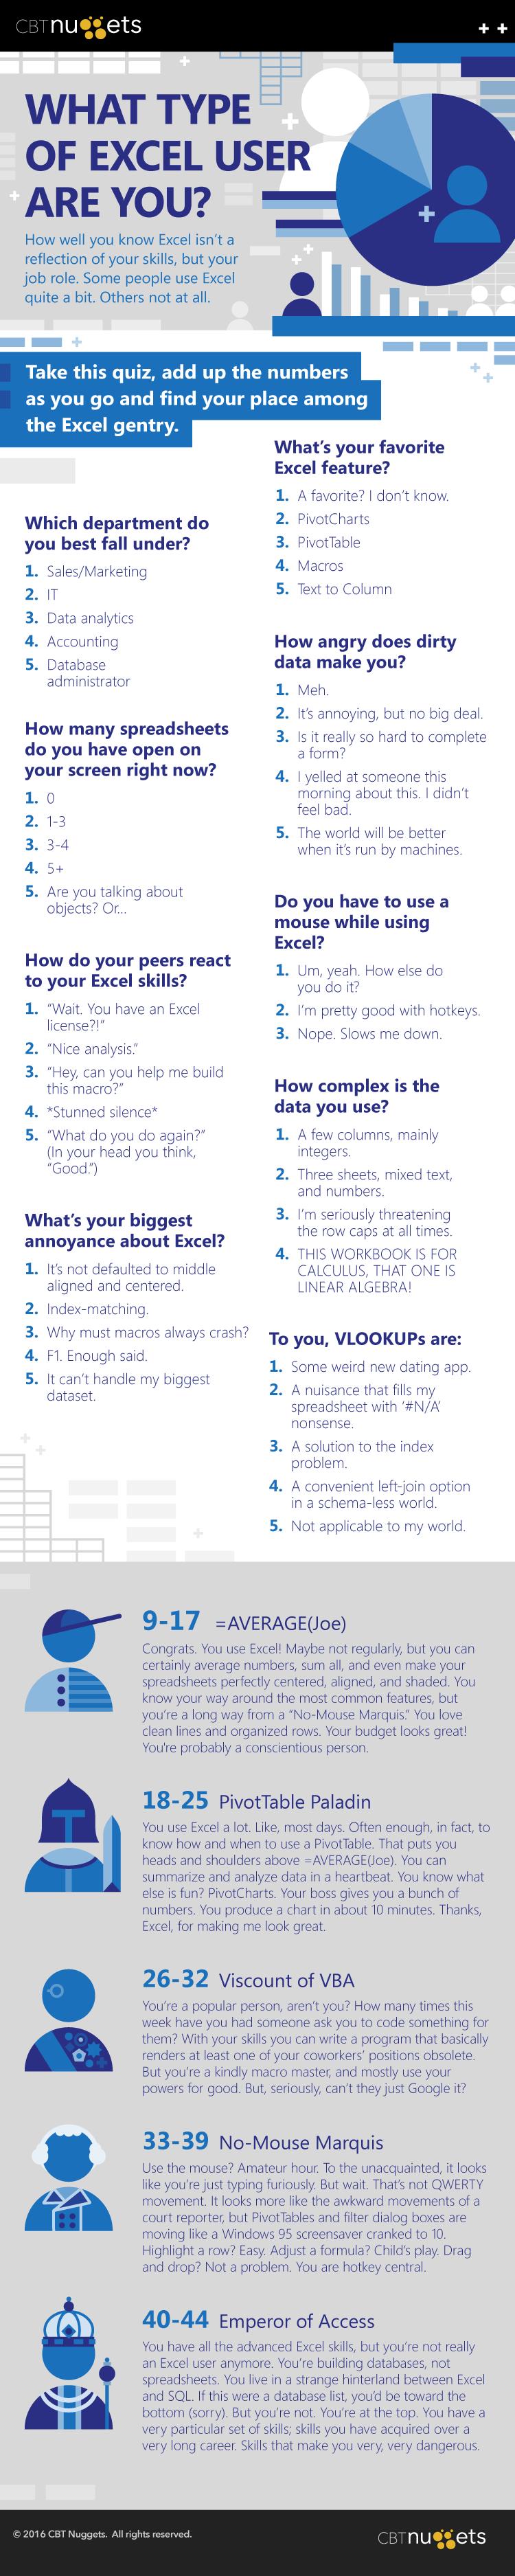 excel-infographic-3